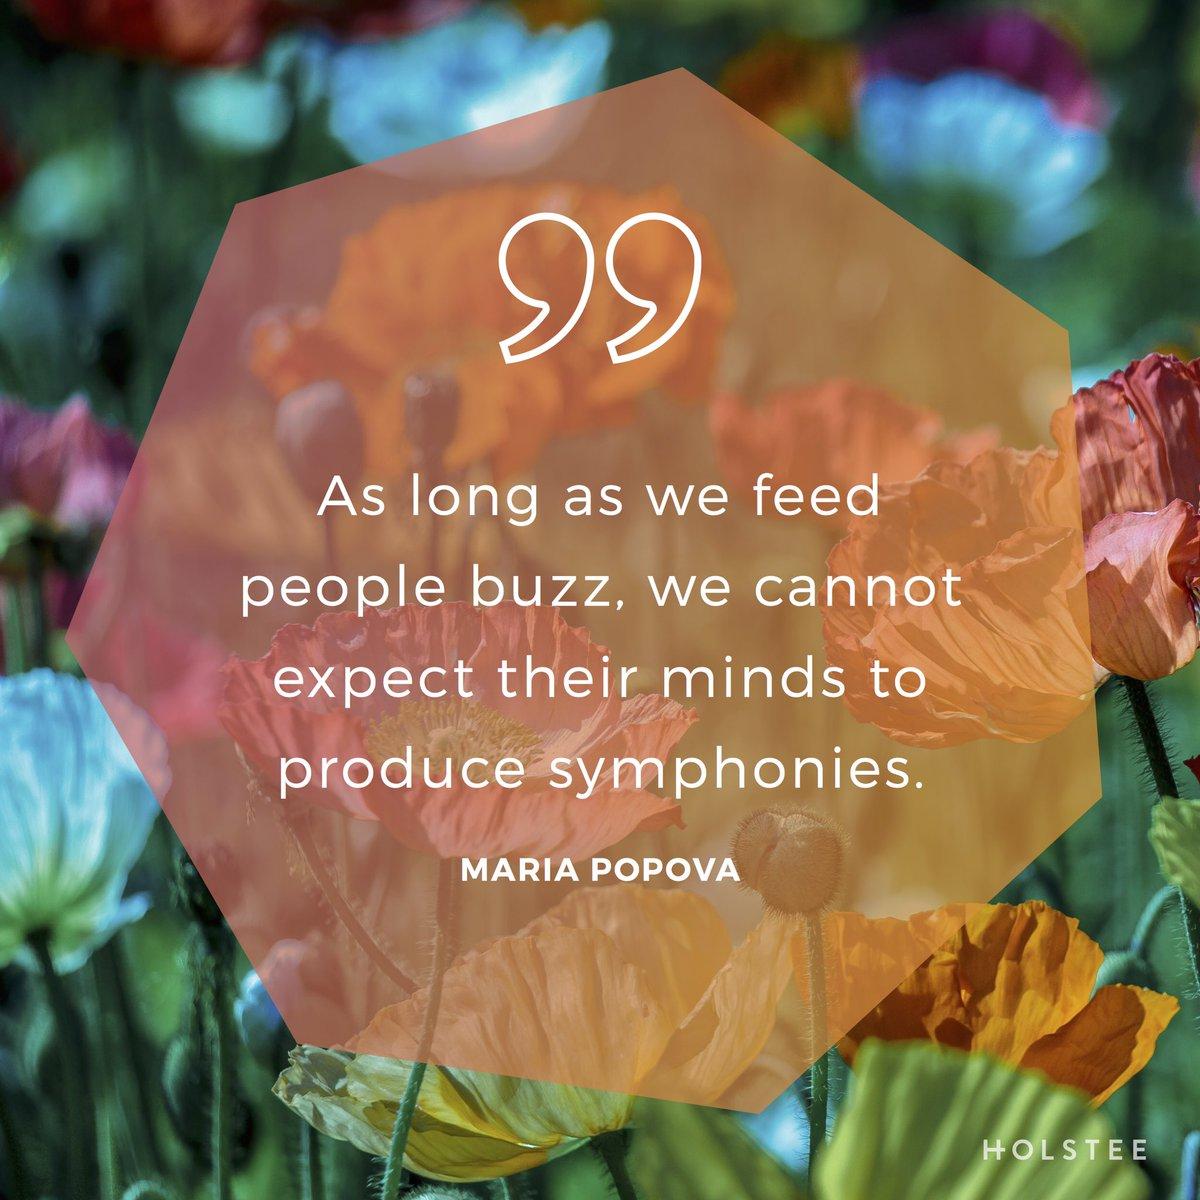 Write your own symphonies. #curiosity and creativity via @brainpicker https://t.co/drBn5xAc2T